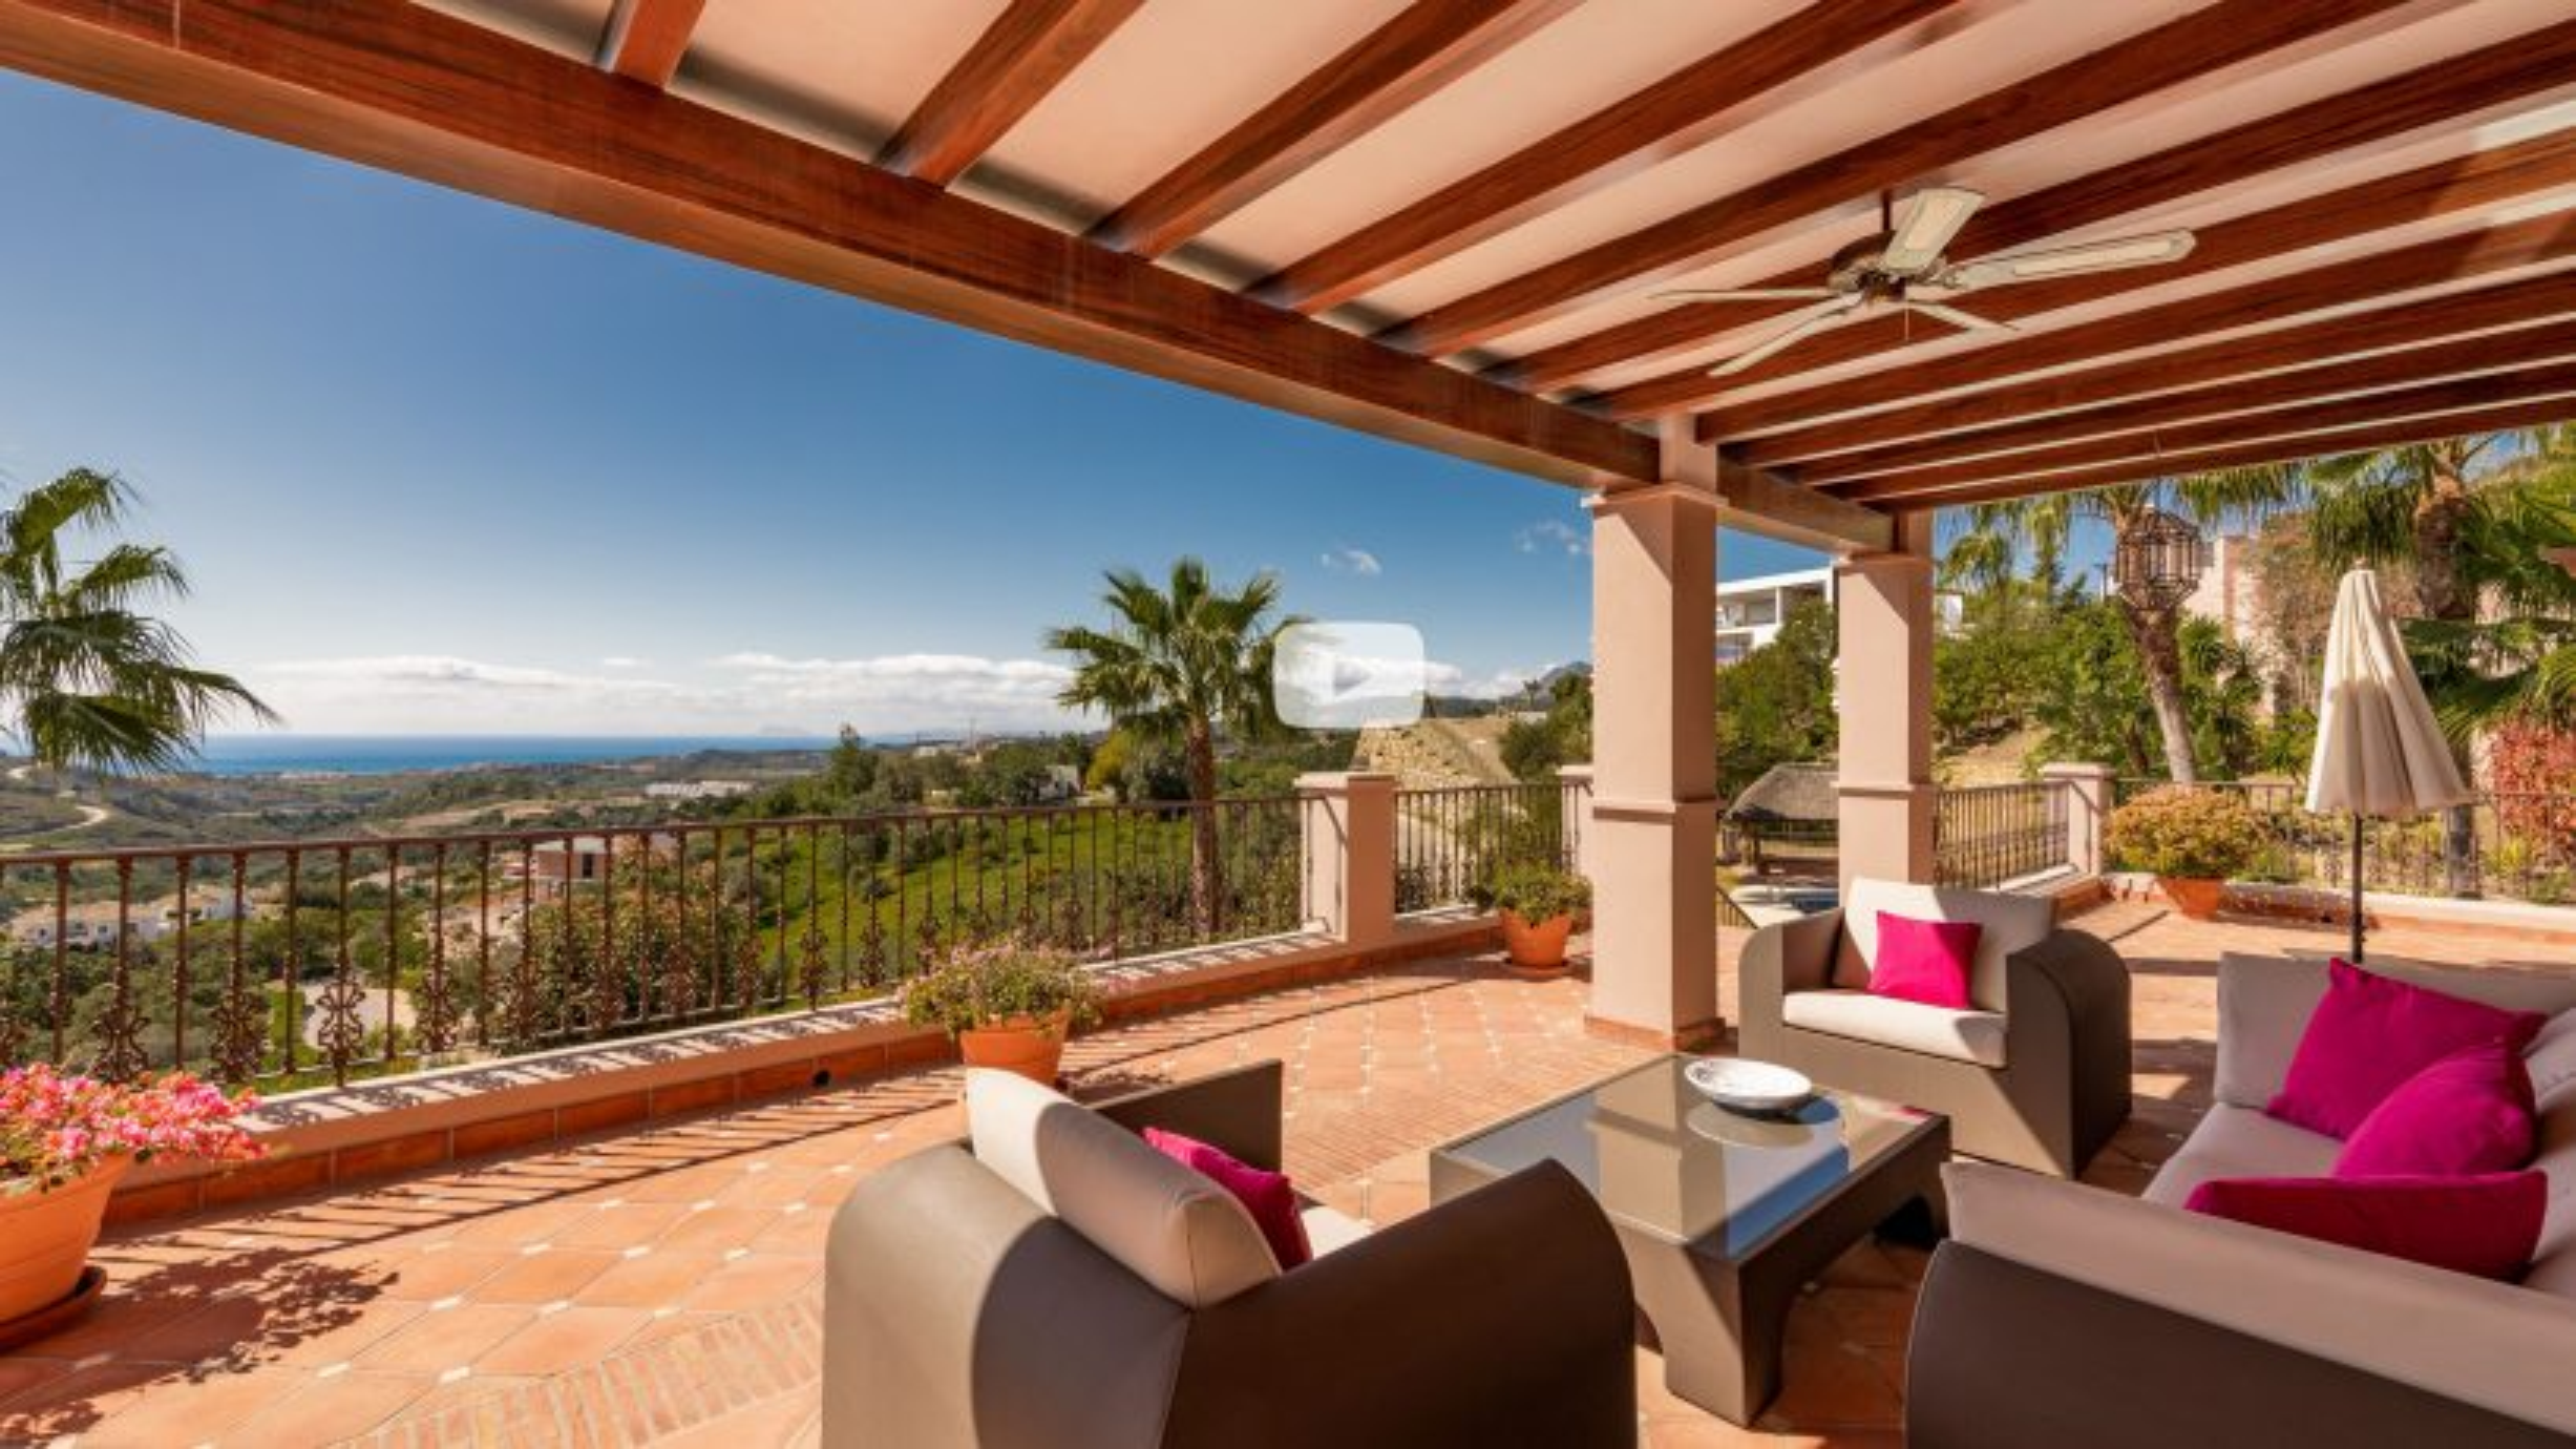 New video: Charming Mediterranean villa with amazing views in Marbella Club Golf Resort